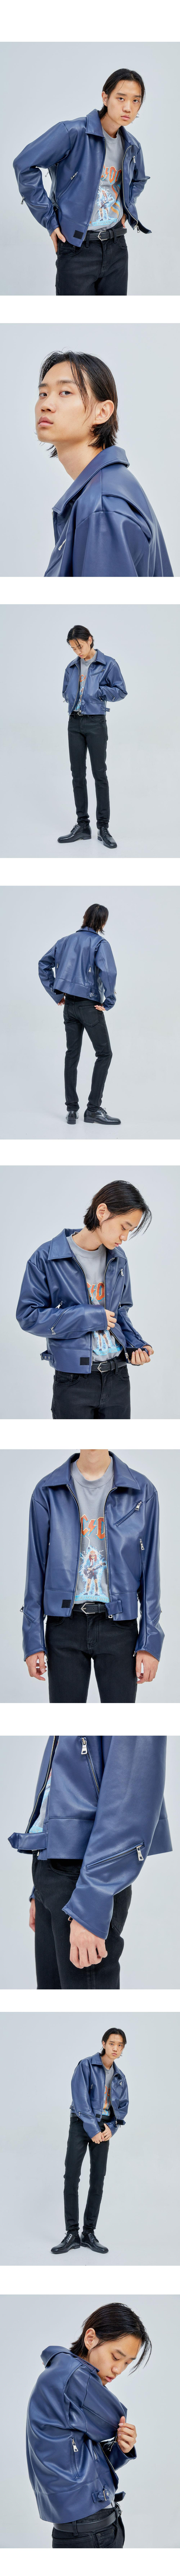 leather collar rider jacket - men